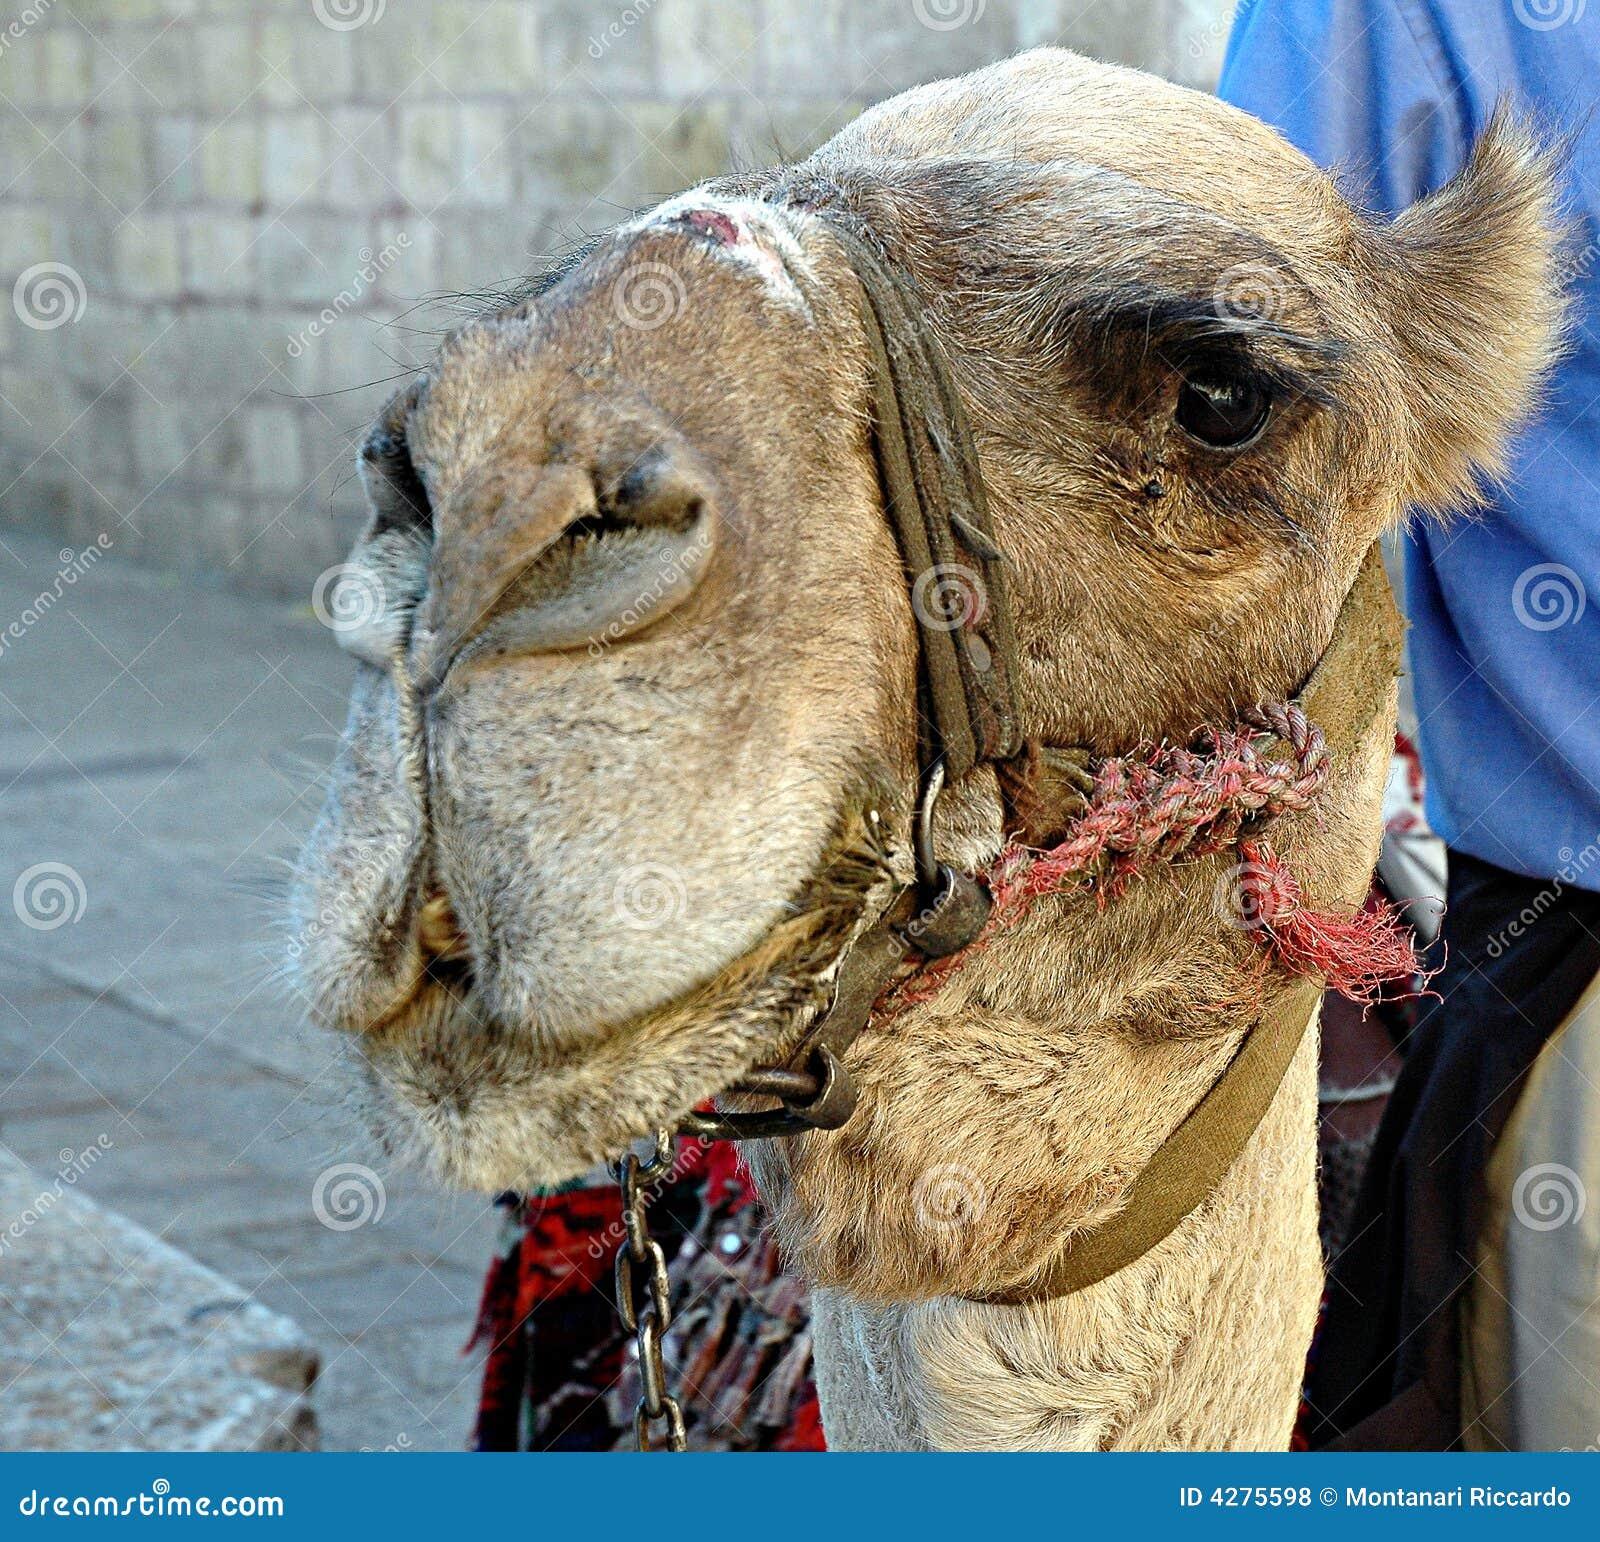 Israelian_Camel